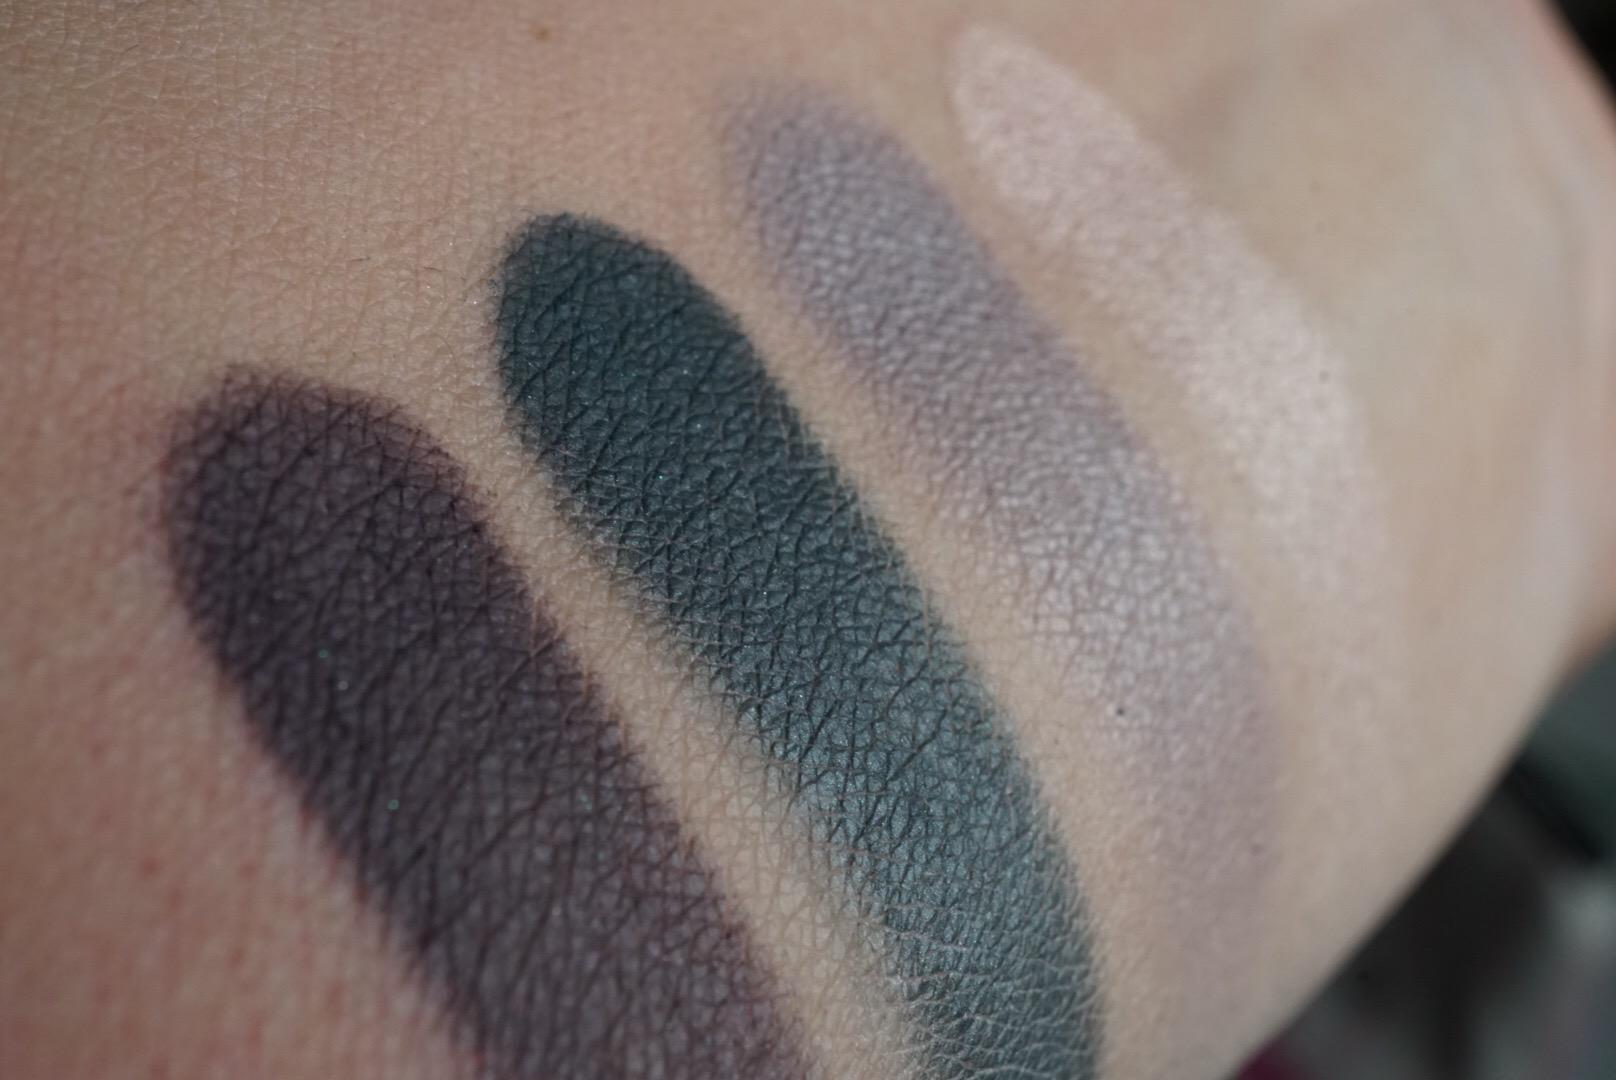 Colourpop x Amanda Steele Weekend Warrior Eyeshadow Palette by Colourpop #14